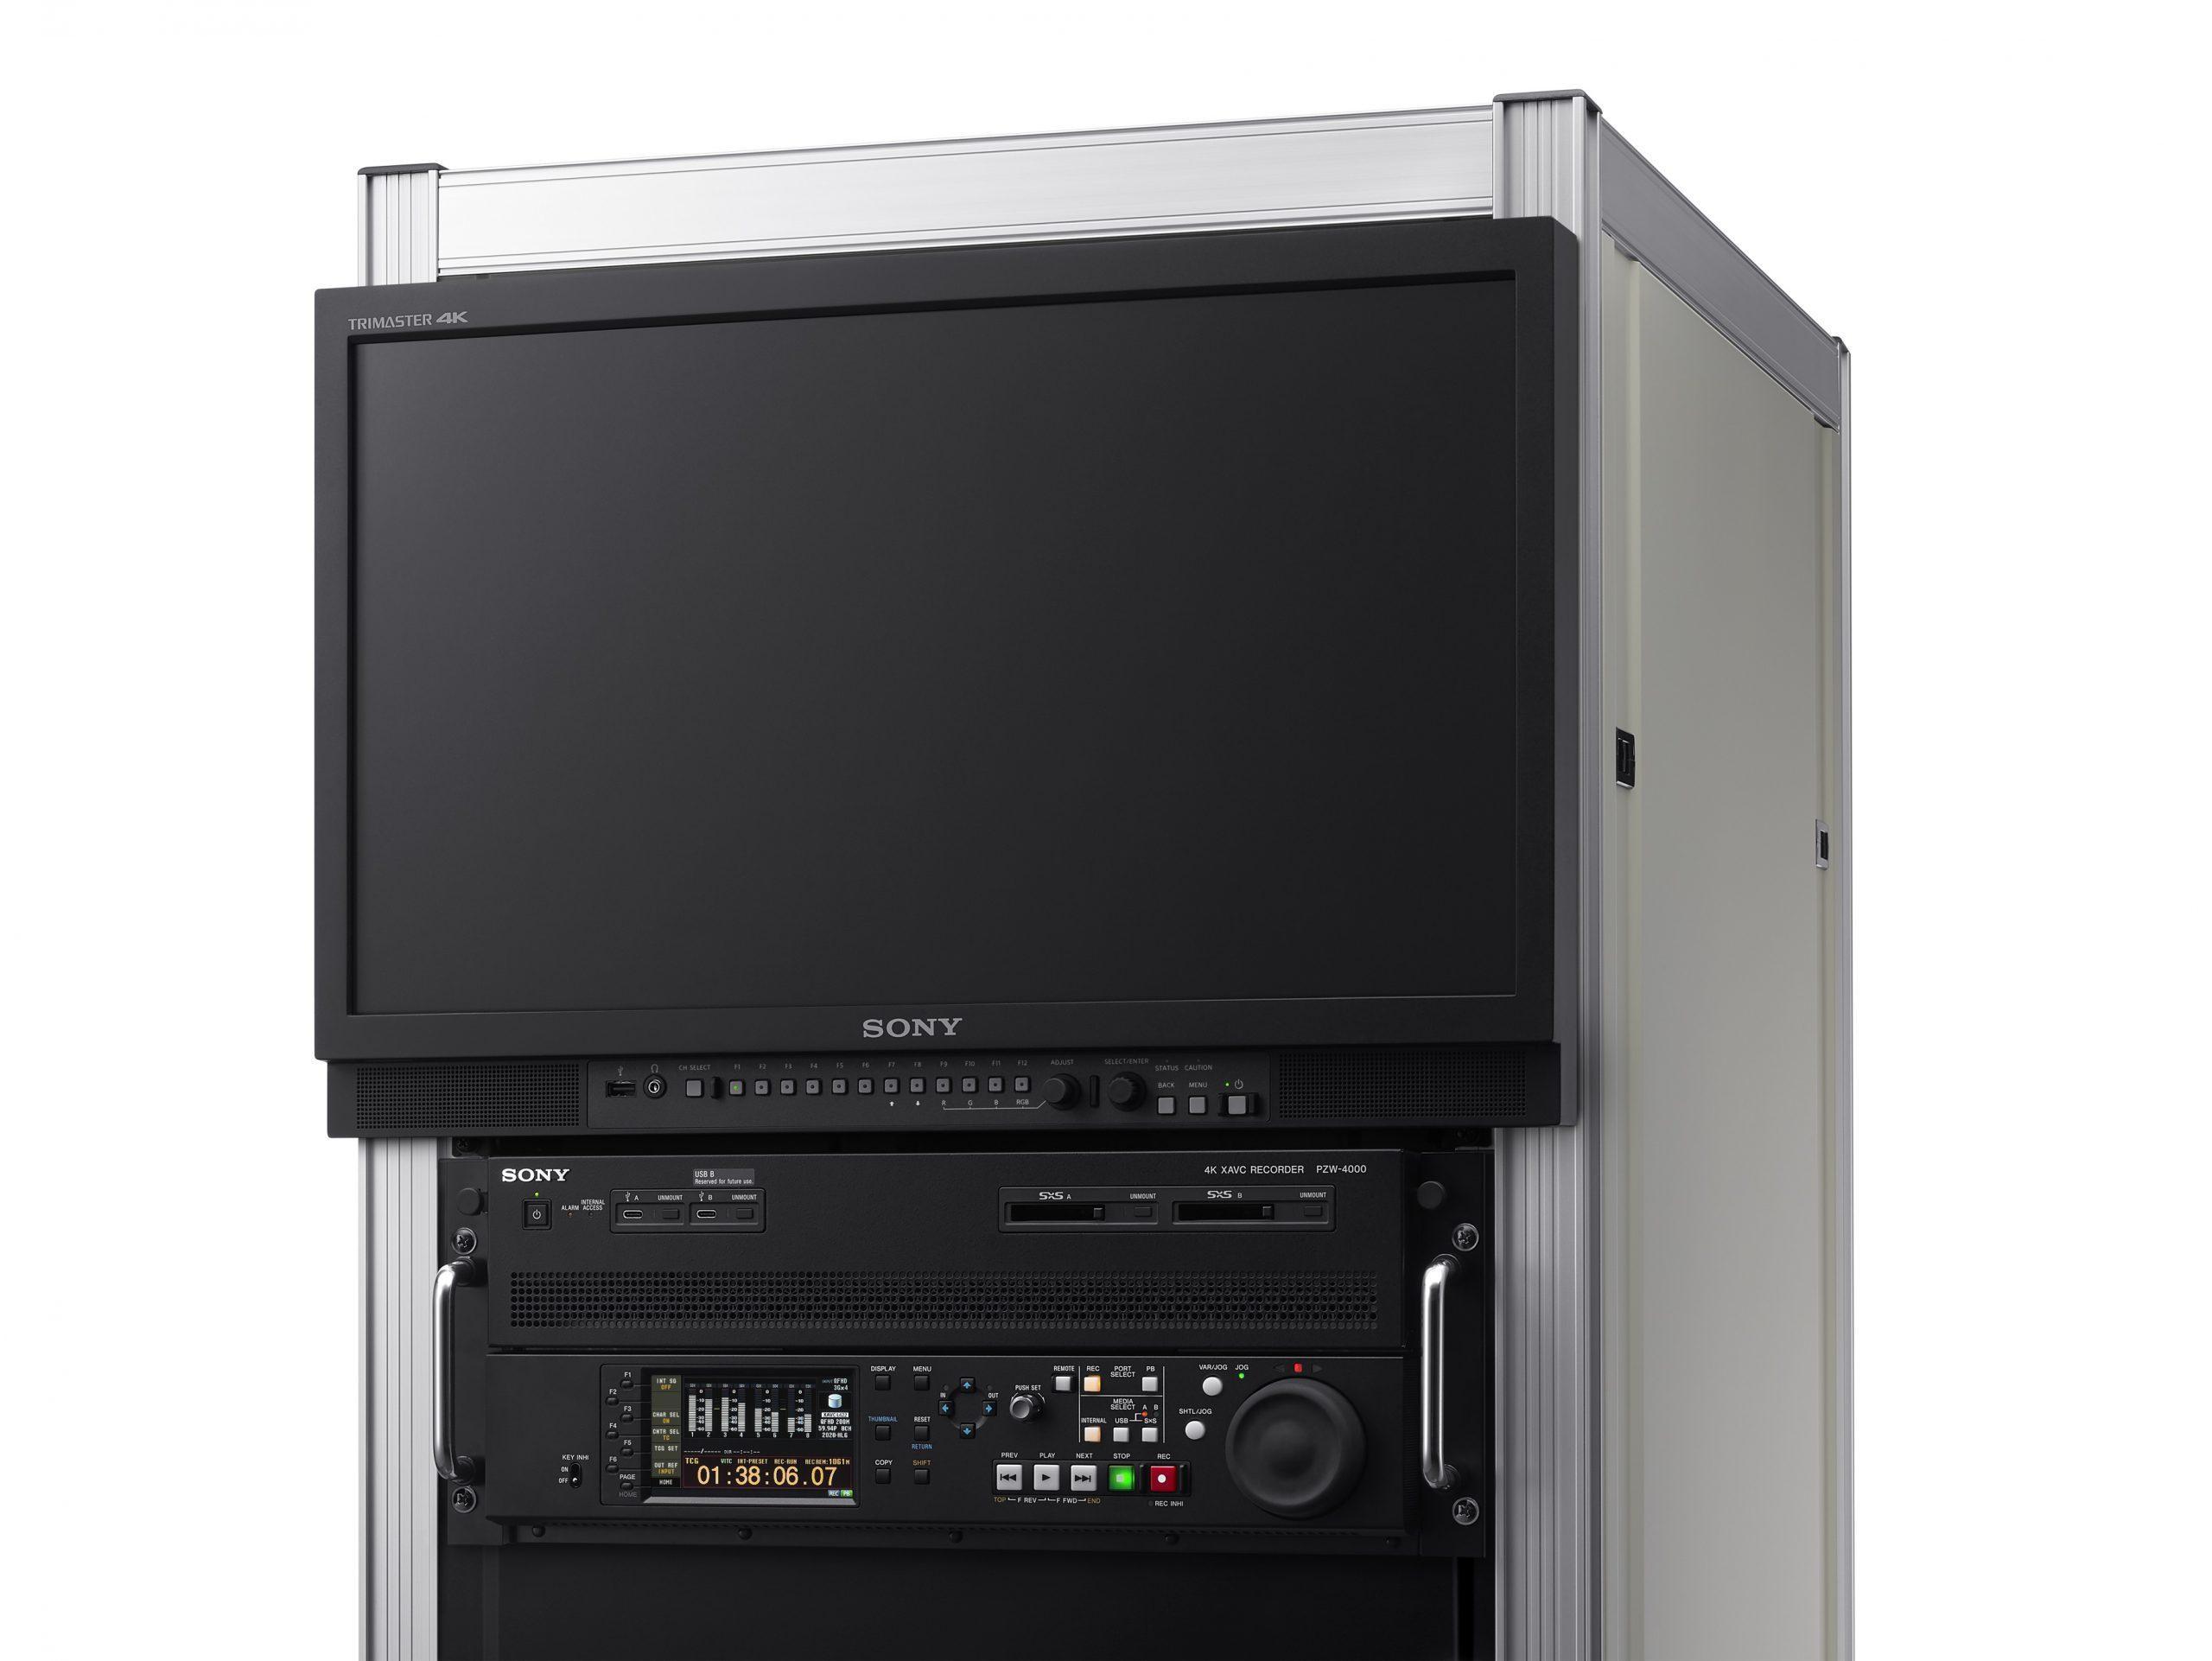 Sony Trimaster PMV-X2400 4K HD rack